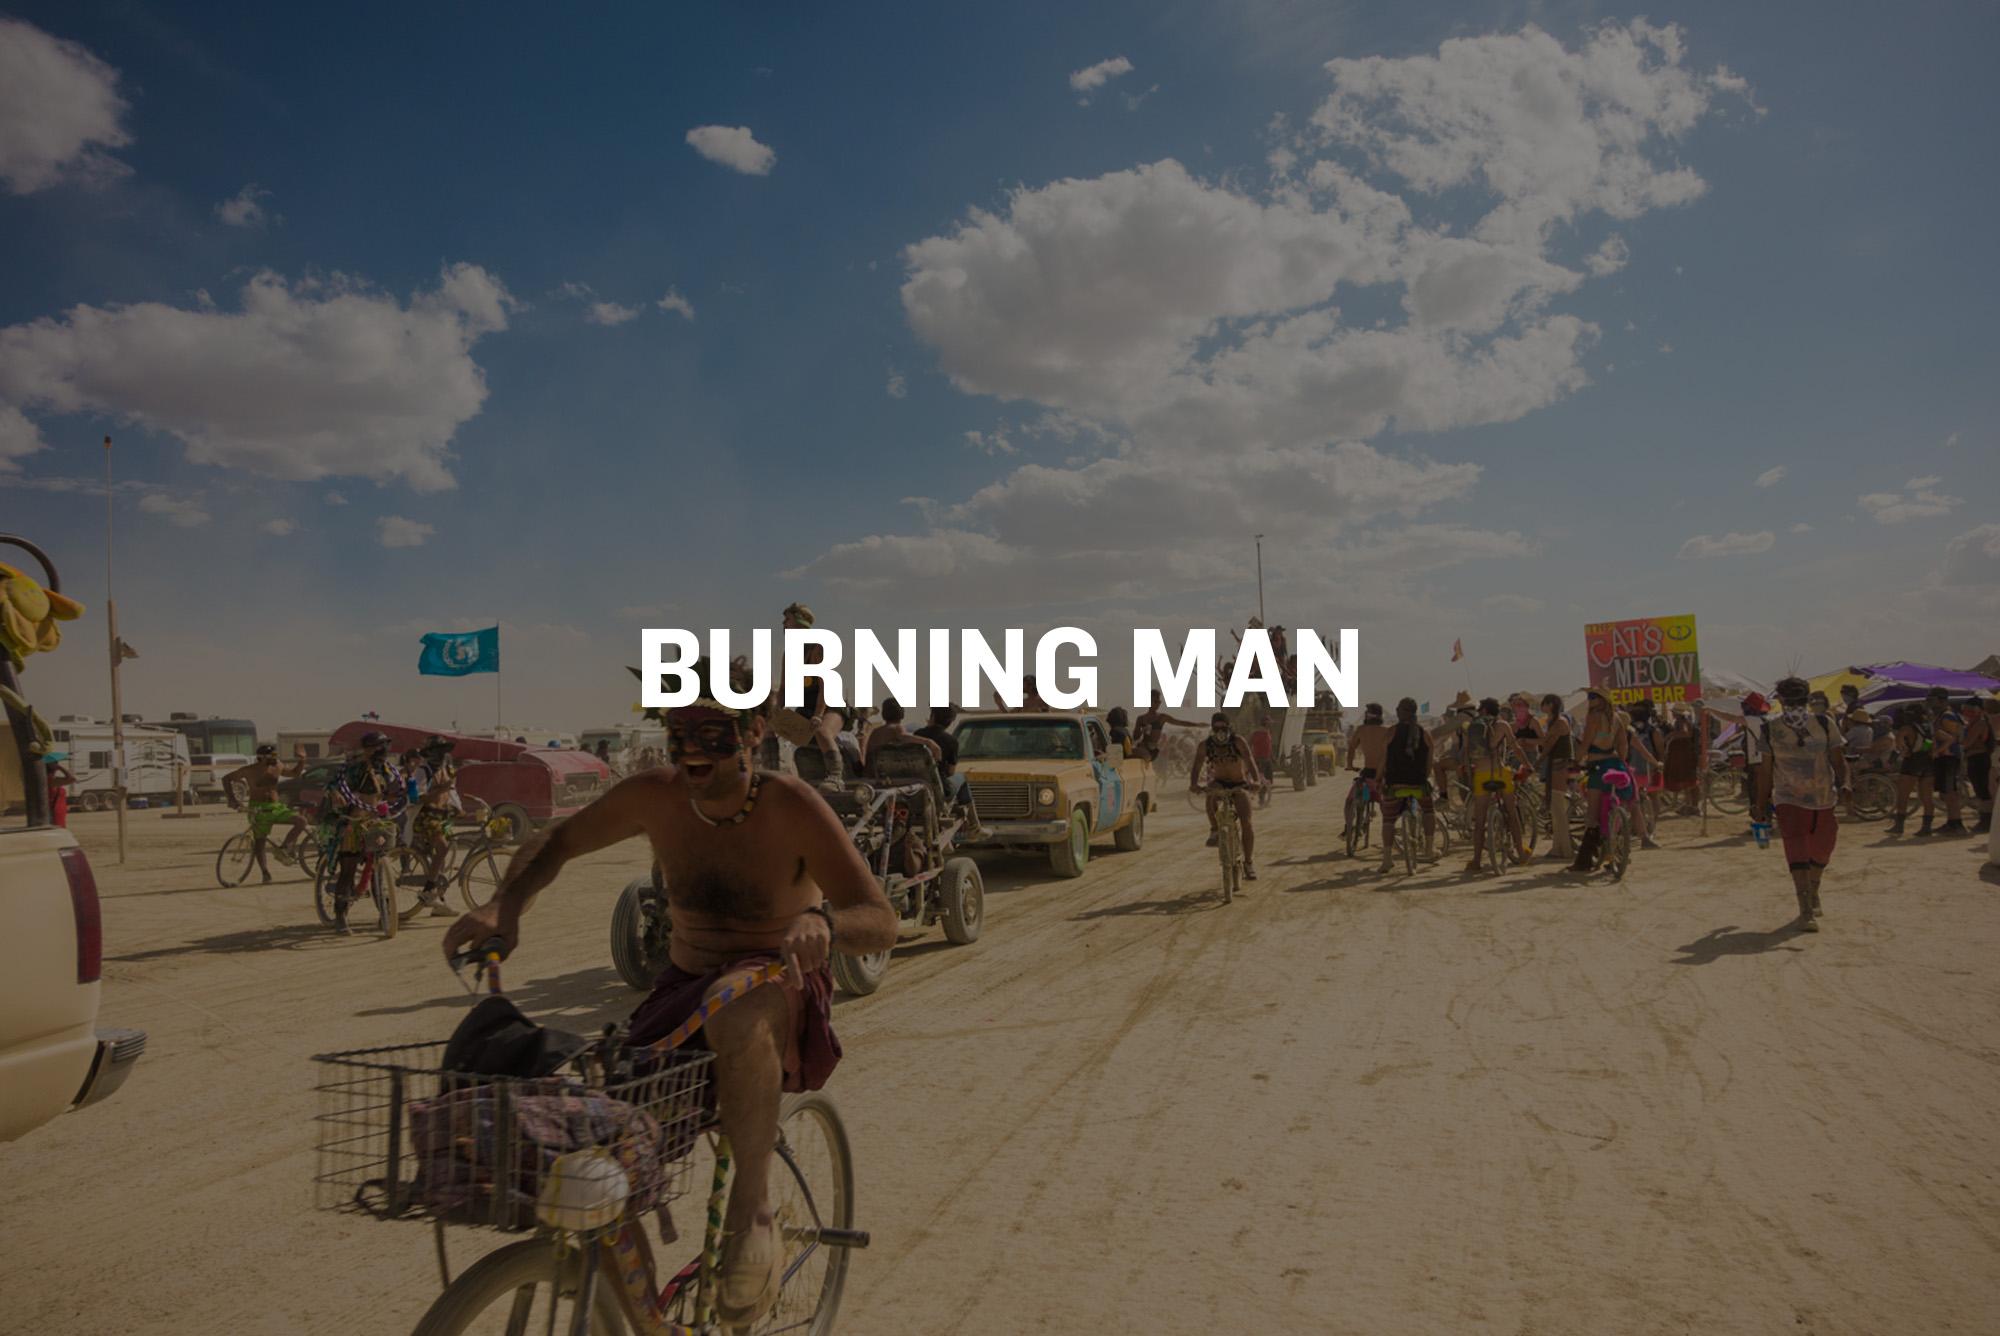 burningmangallerycover.jpg